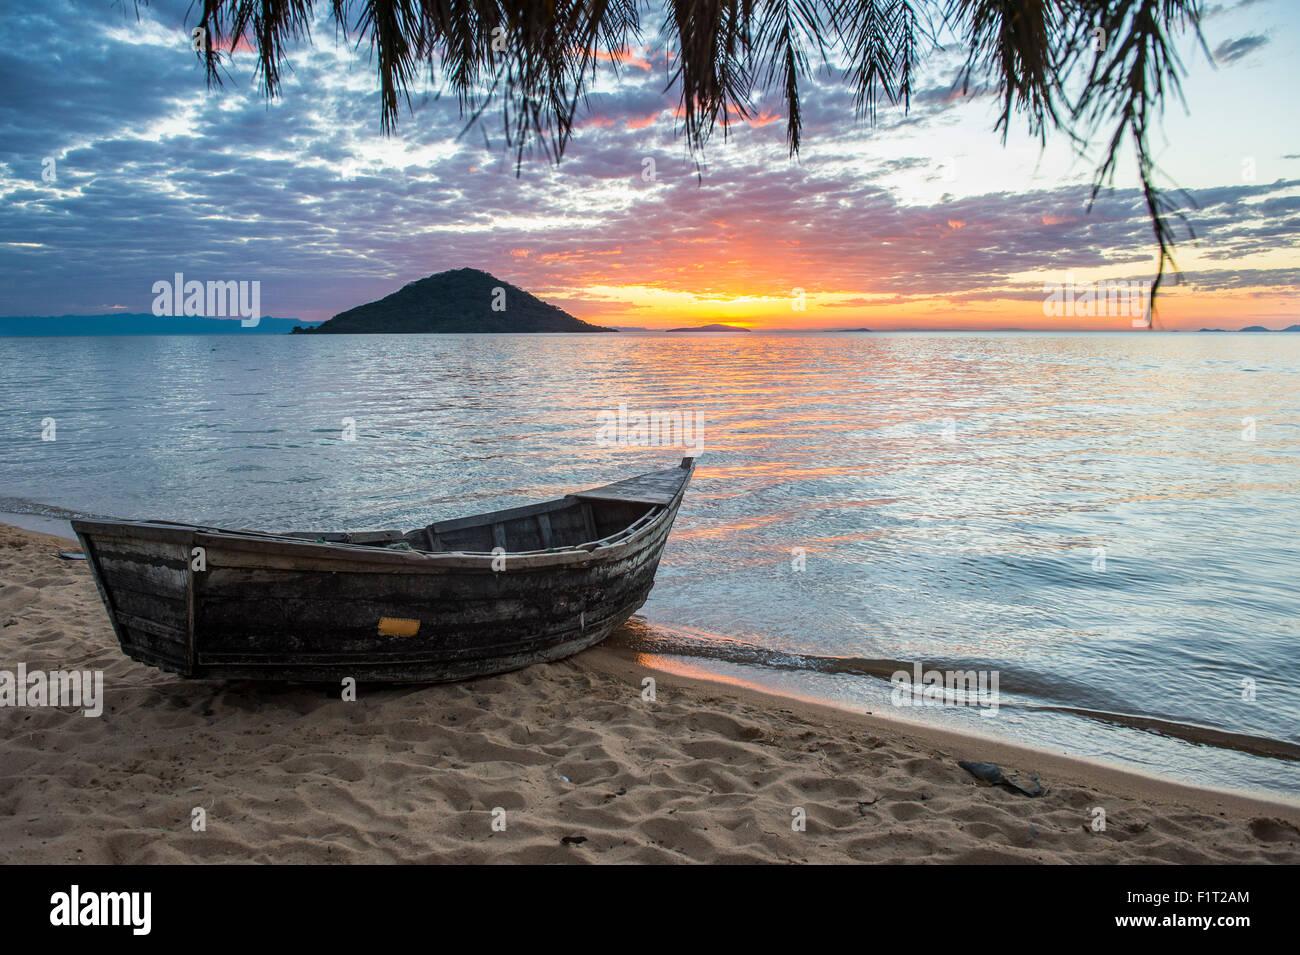 Fishing boat at sunset at Cape Malcear, Lake Malawi, Malawi, Africa - Stock Image